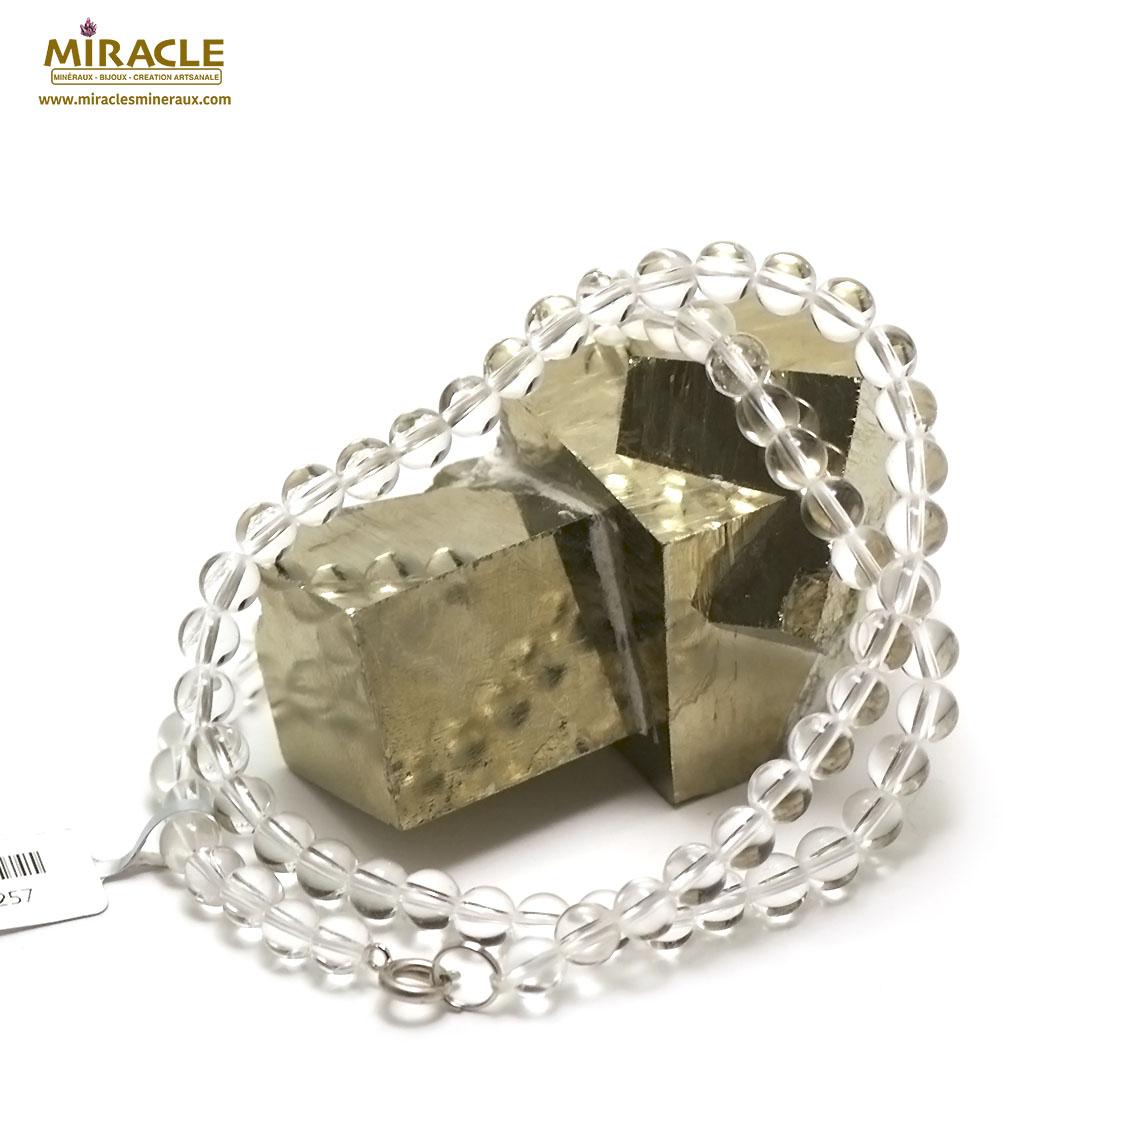 Collier cristal de roche , perle ronde 6 mm